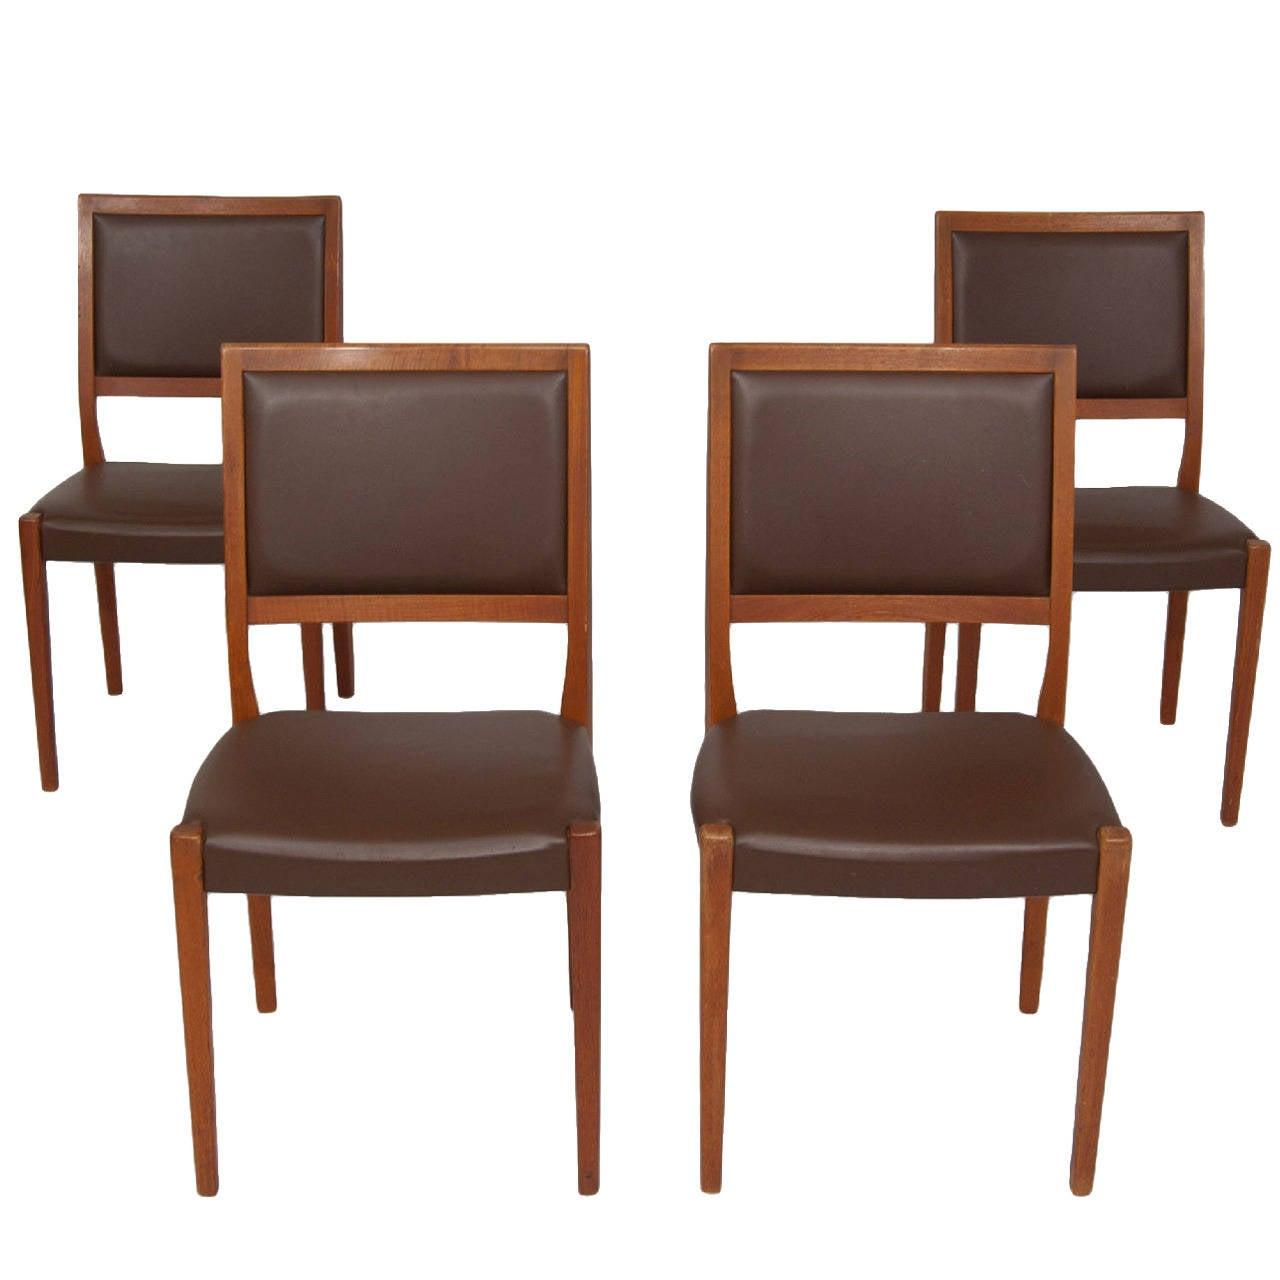 set of 4 dining chairs paris bistro outdoor svegards markaryd four teak for sale